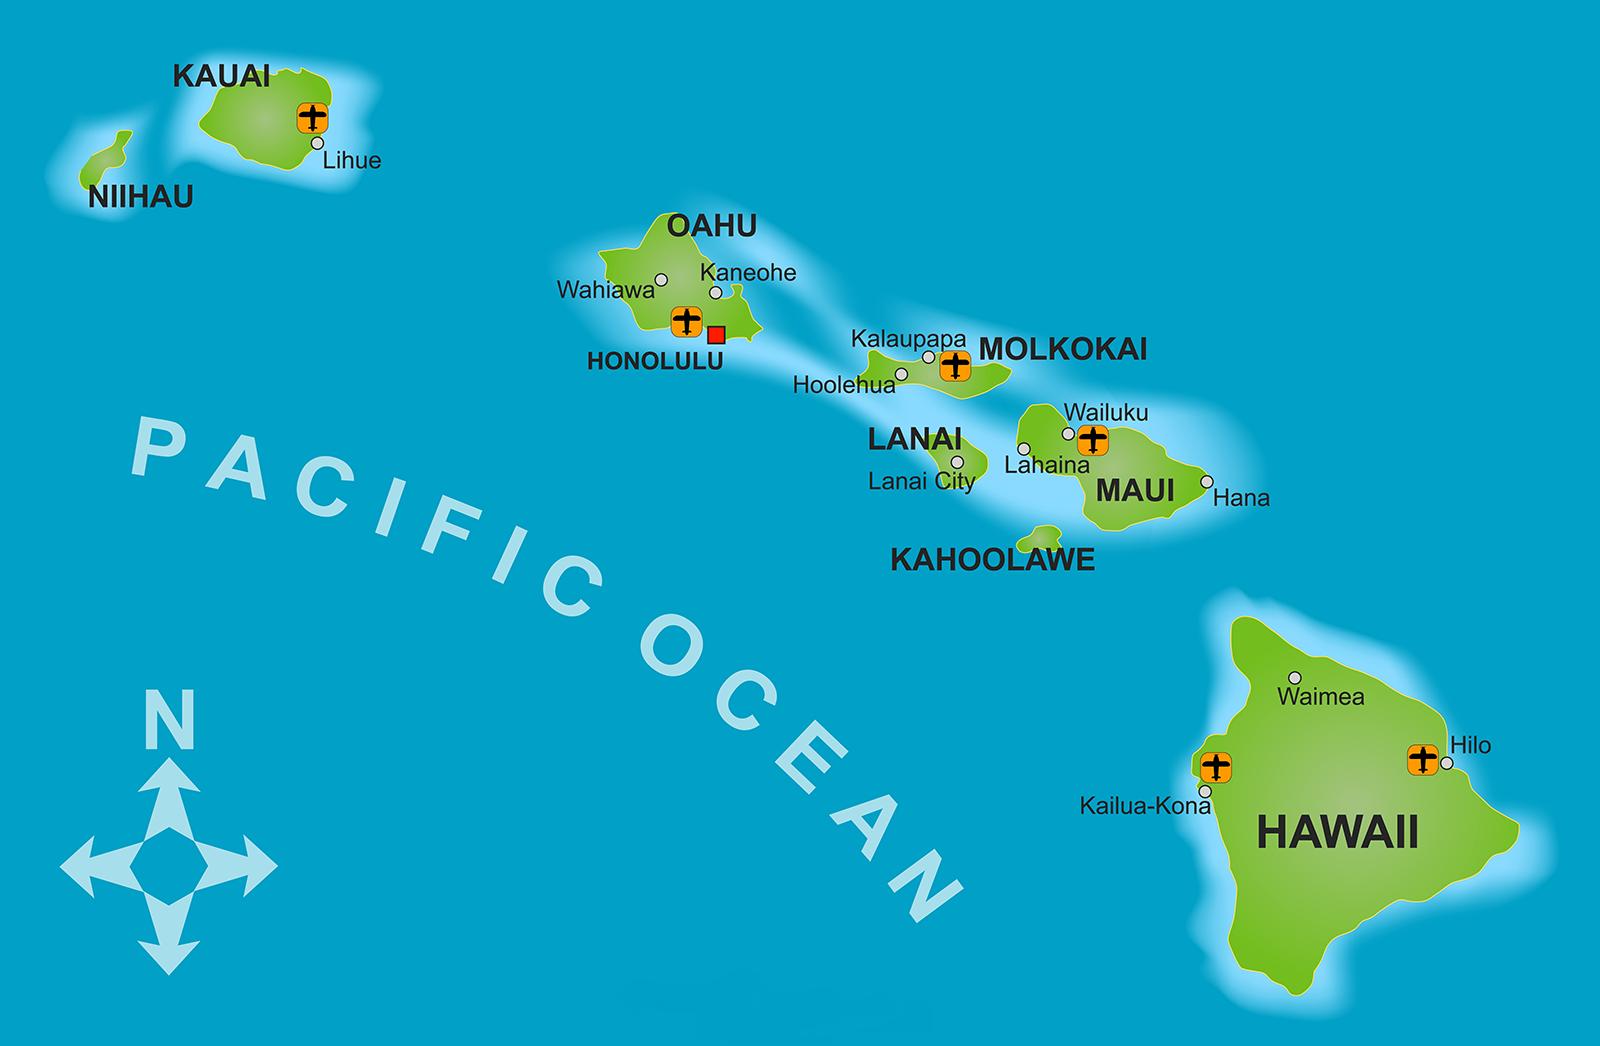 hawaii pacific ocean map Hawaii Us State Central Pacific Ocean Map Of Hawaii Hawaii hawaii pacific ocean map